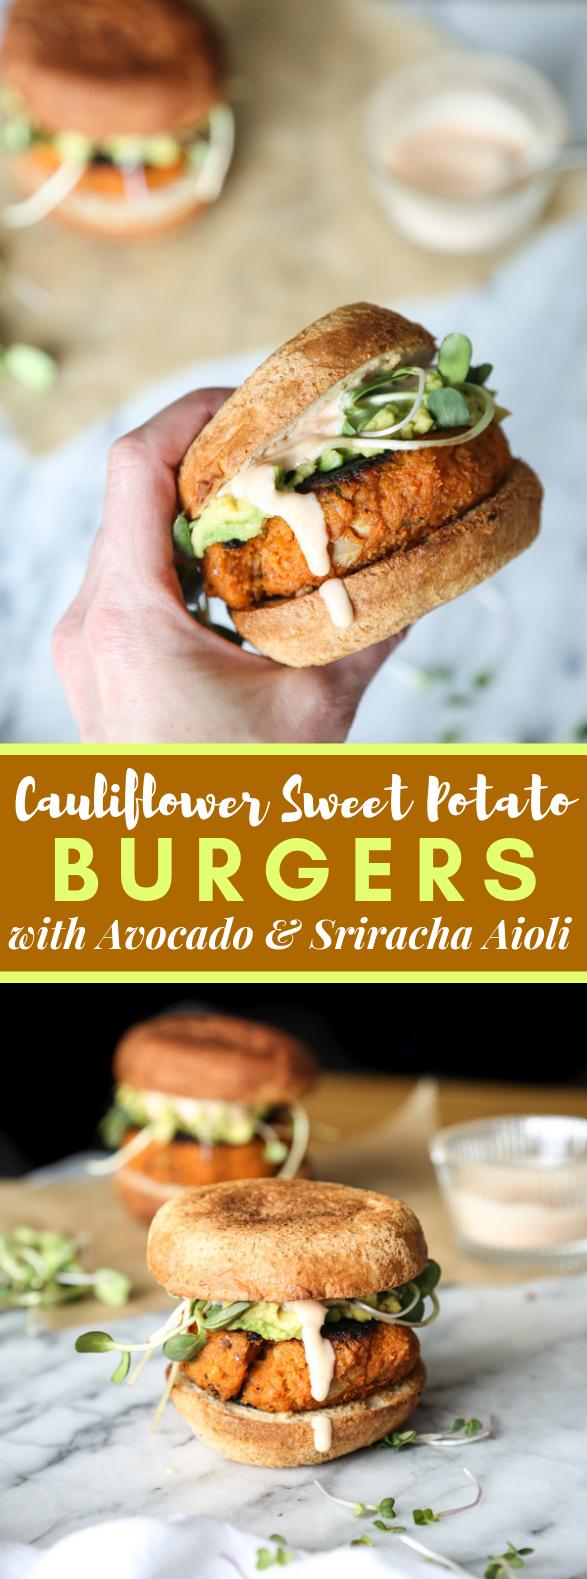 Cauliflower Sweet Potato Burgers with Avocado and Sriracha Aioli (Vegetarian Paleo) #veggies #recipes